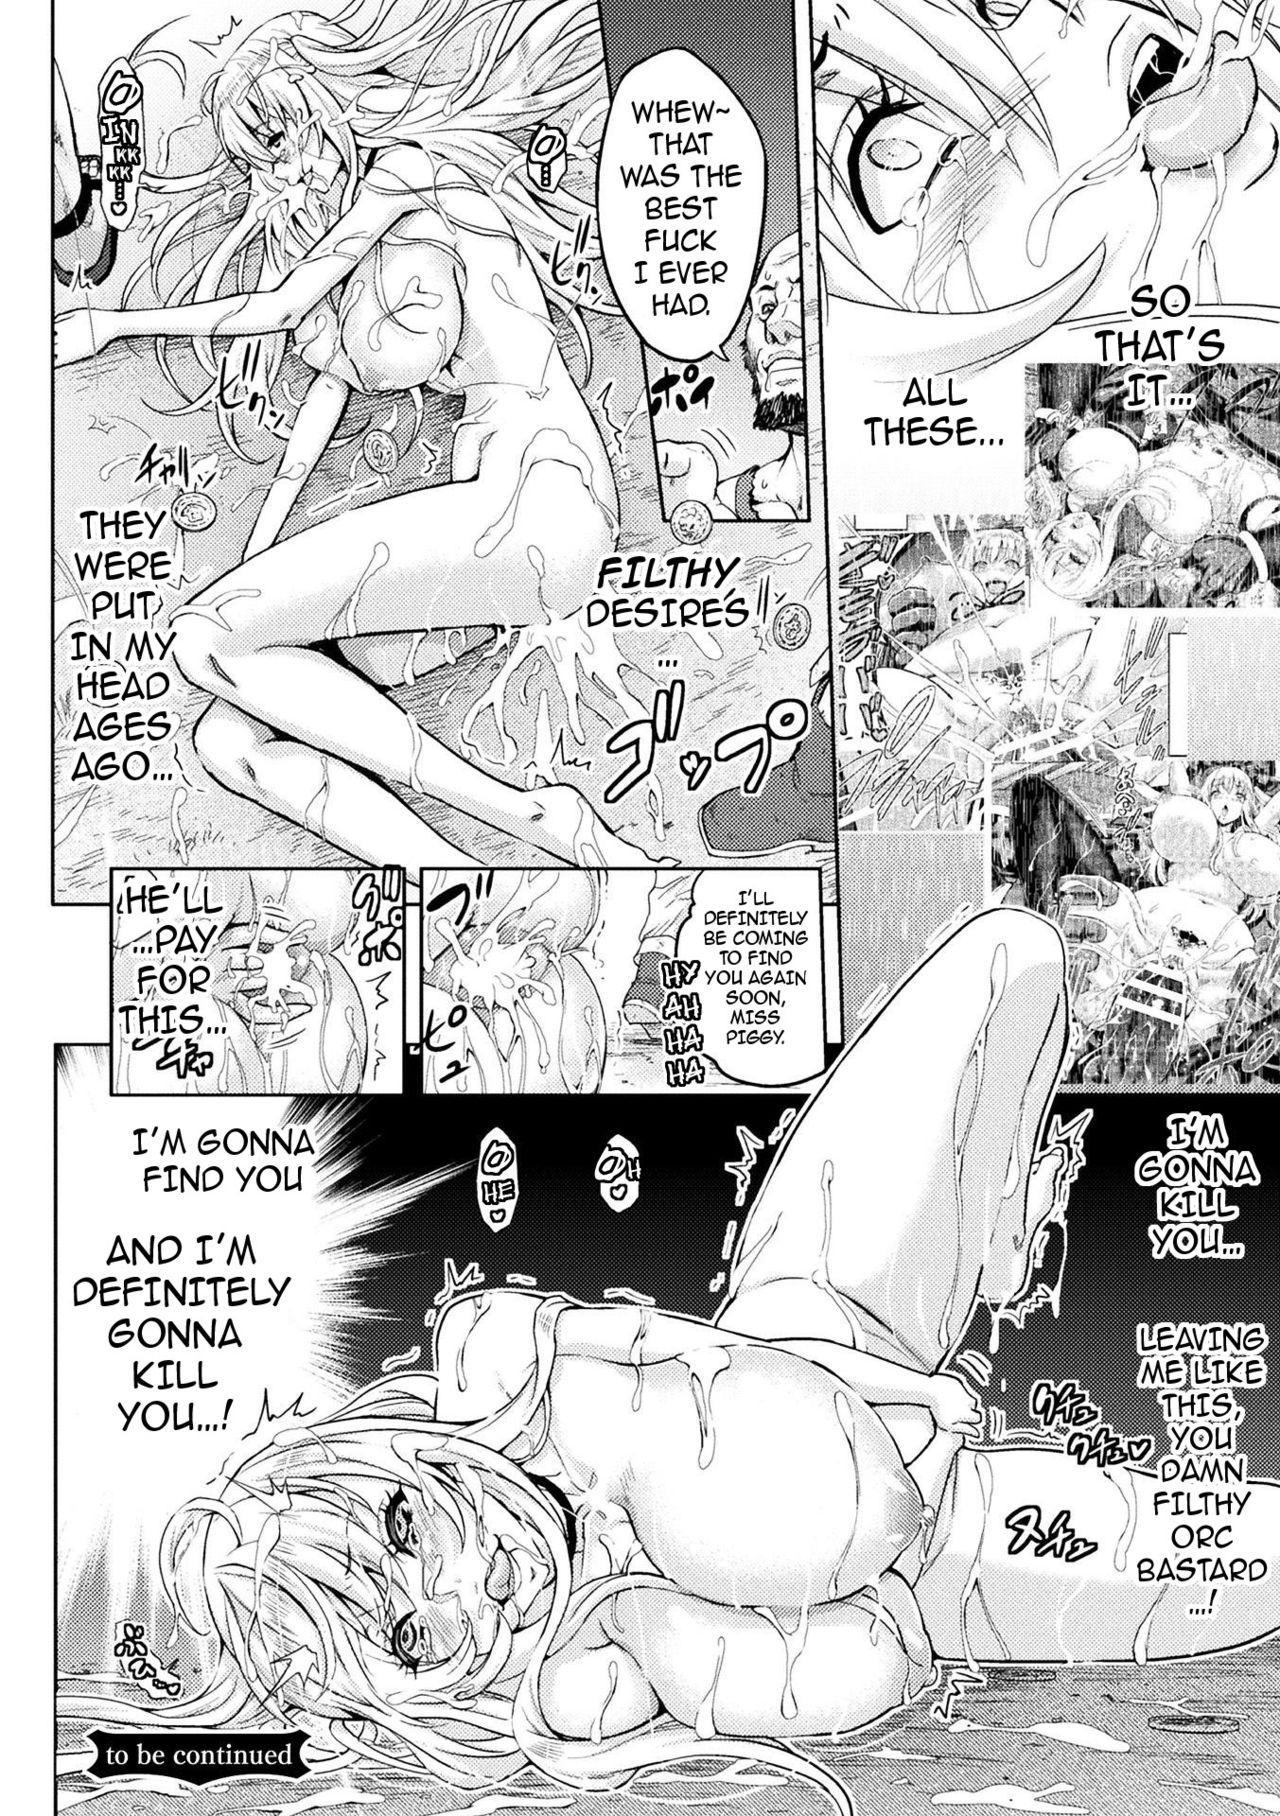 [Yamada Gogogo] Erona ~Orc no Inmon ni Okasareta Onna Kishi no Matsuro~   Erona ~The Fall of a Beautiful Knight Cursed with the Lewd Mark of an Orc~ Ch. 1-6 [English] {darknight} 152